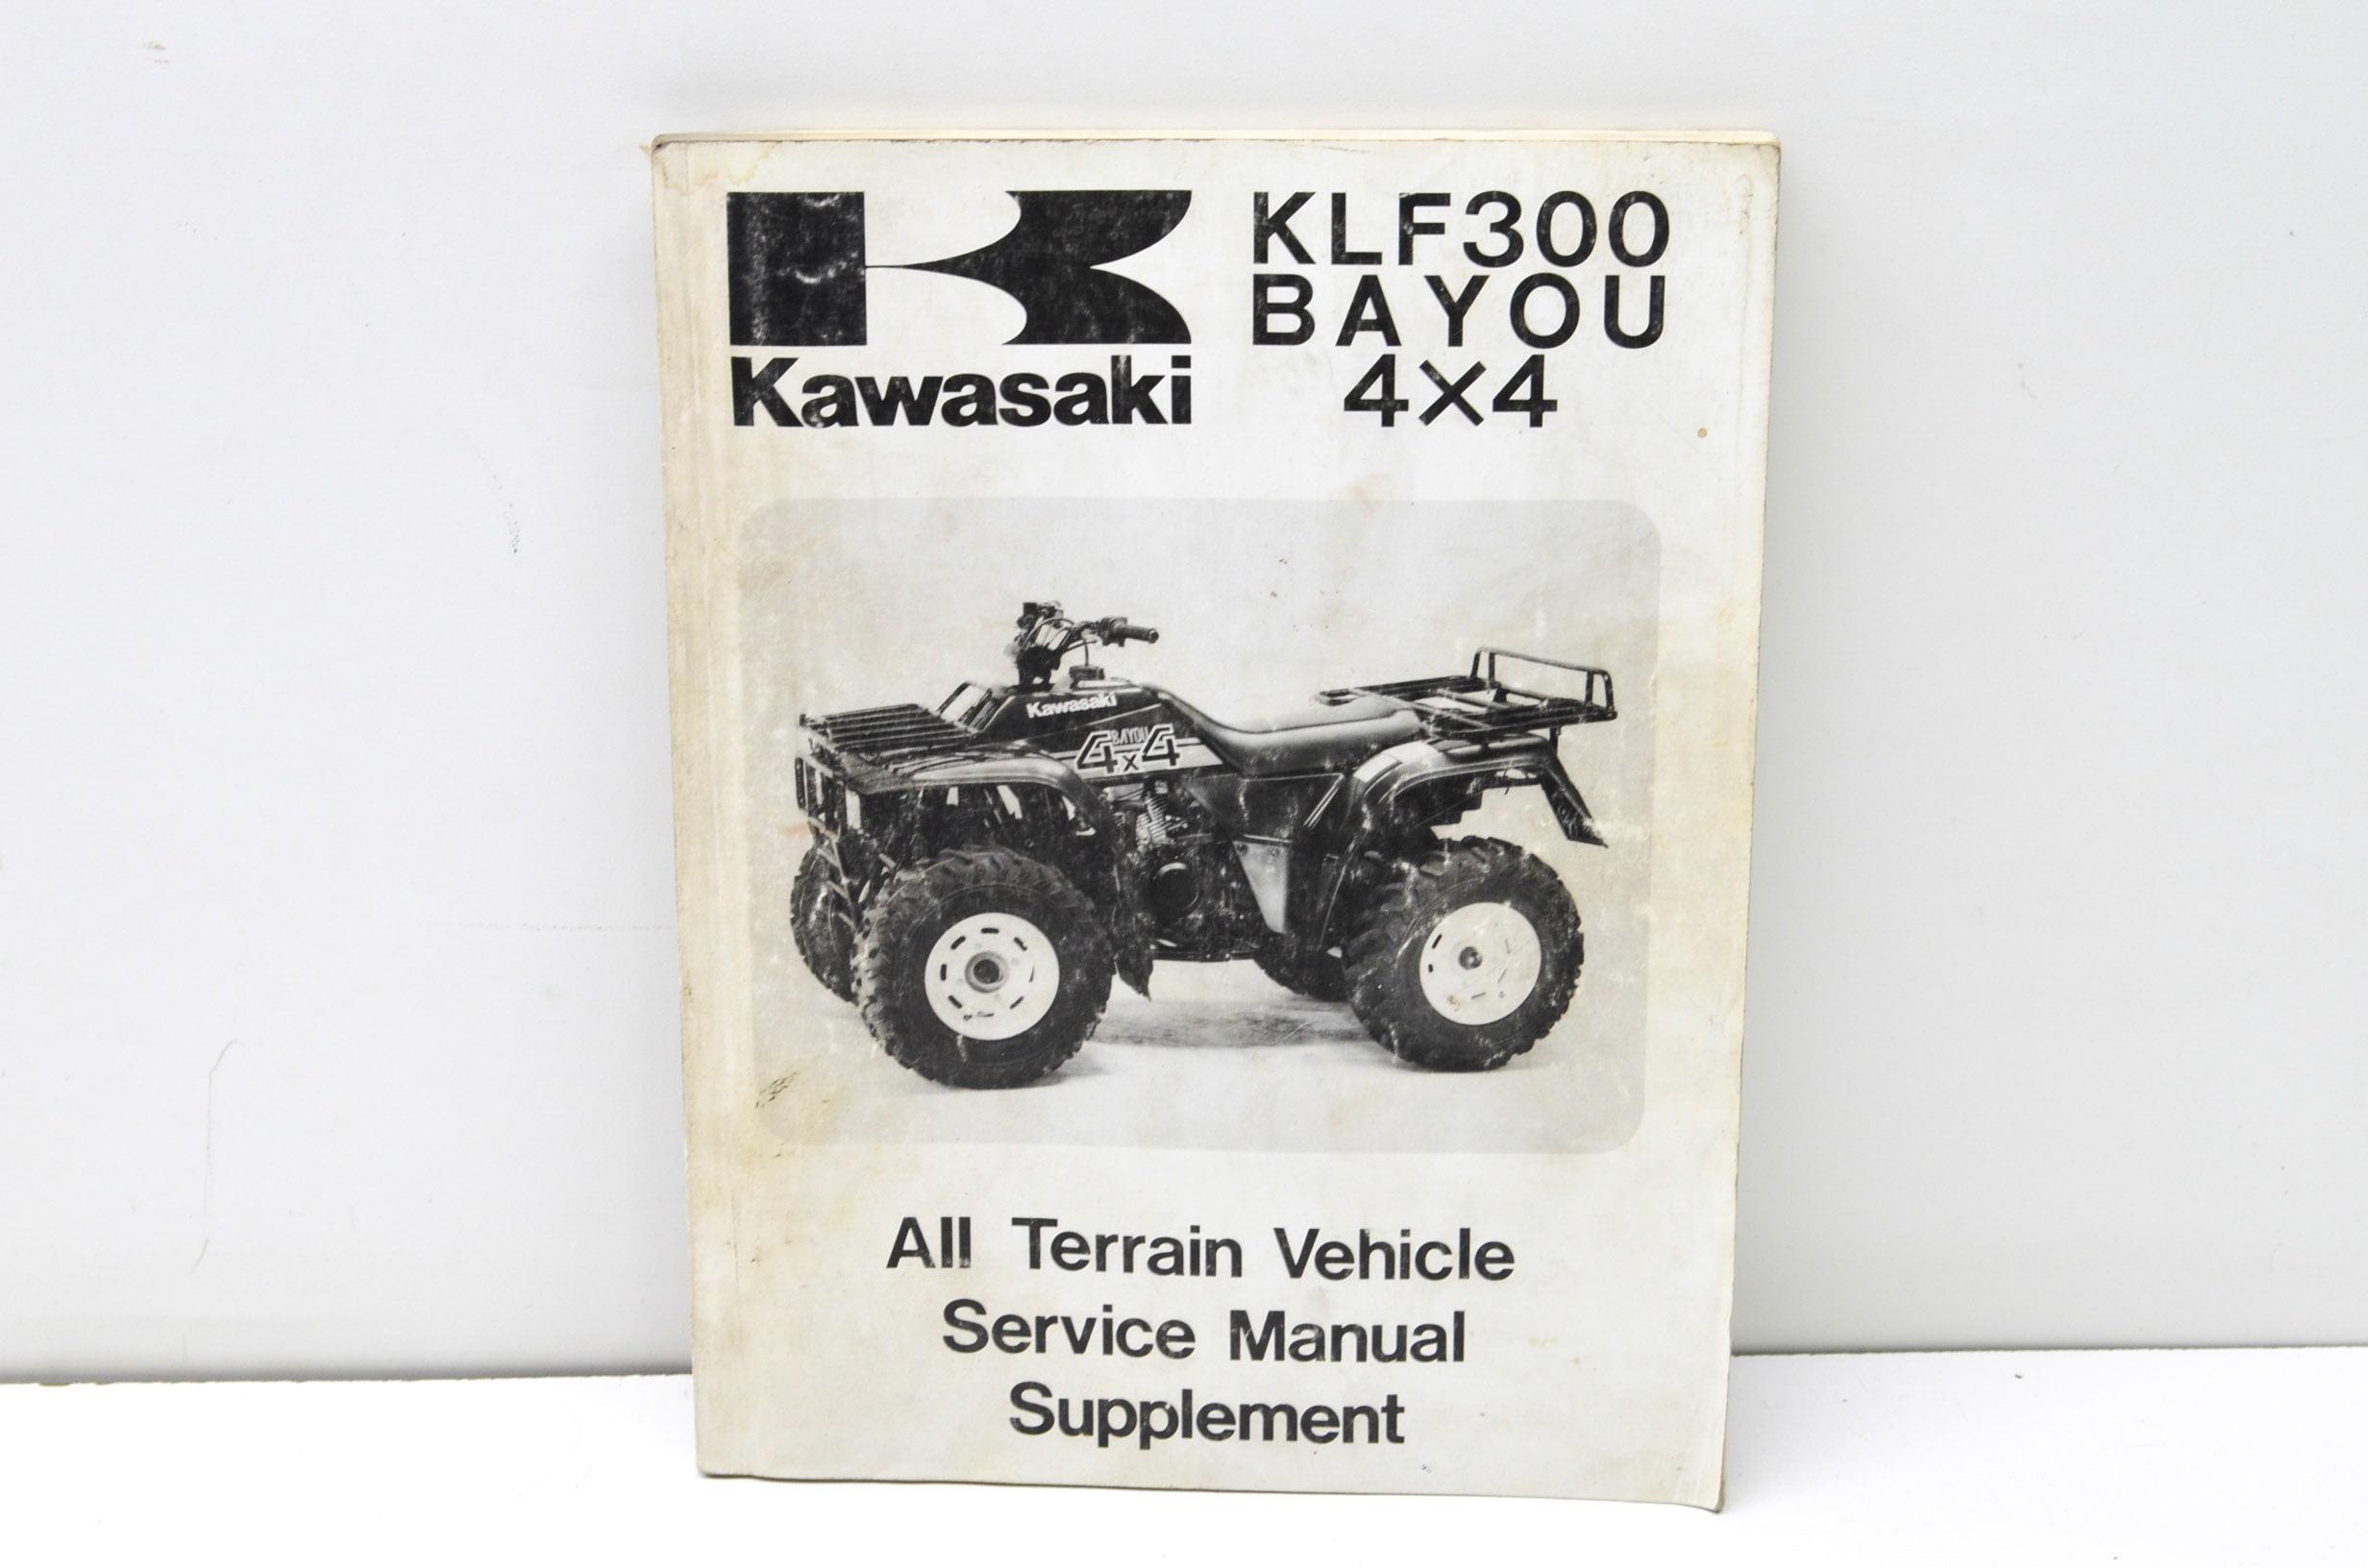 Moose Racing Pre-OIled Air Filter Kawasaki KLF300 Bayou 1989-2004